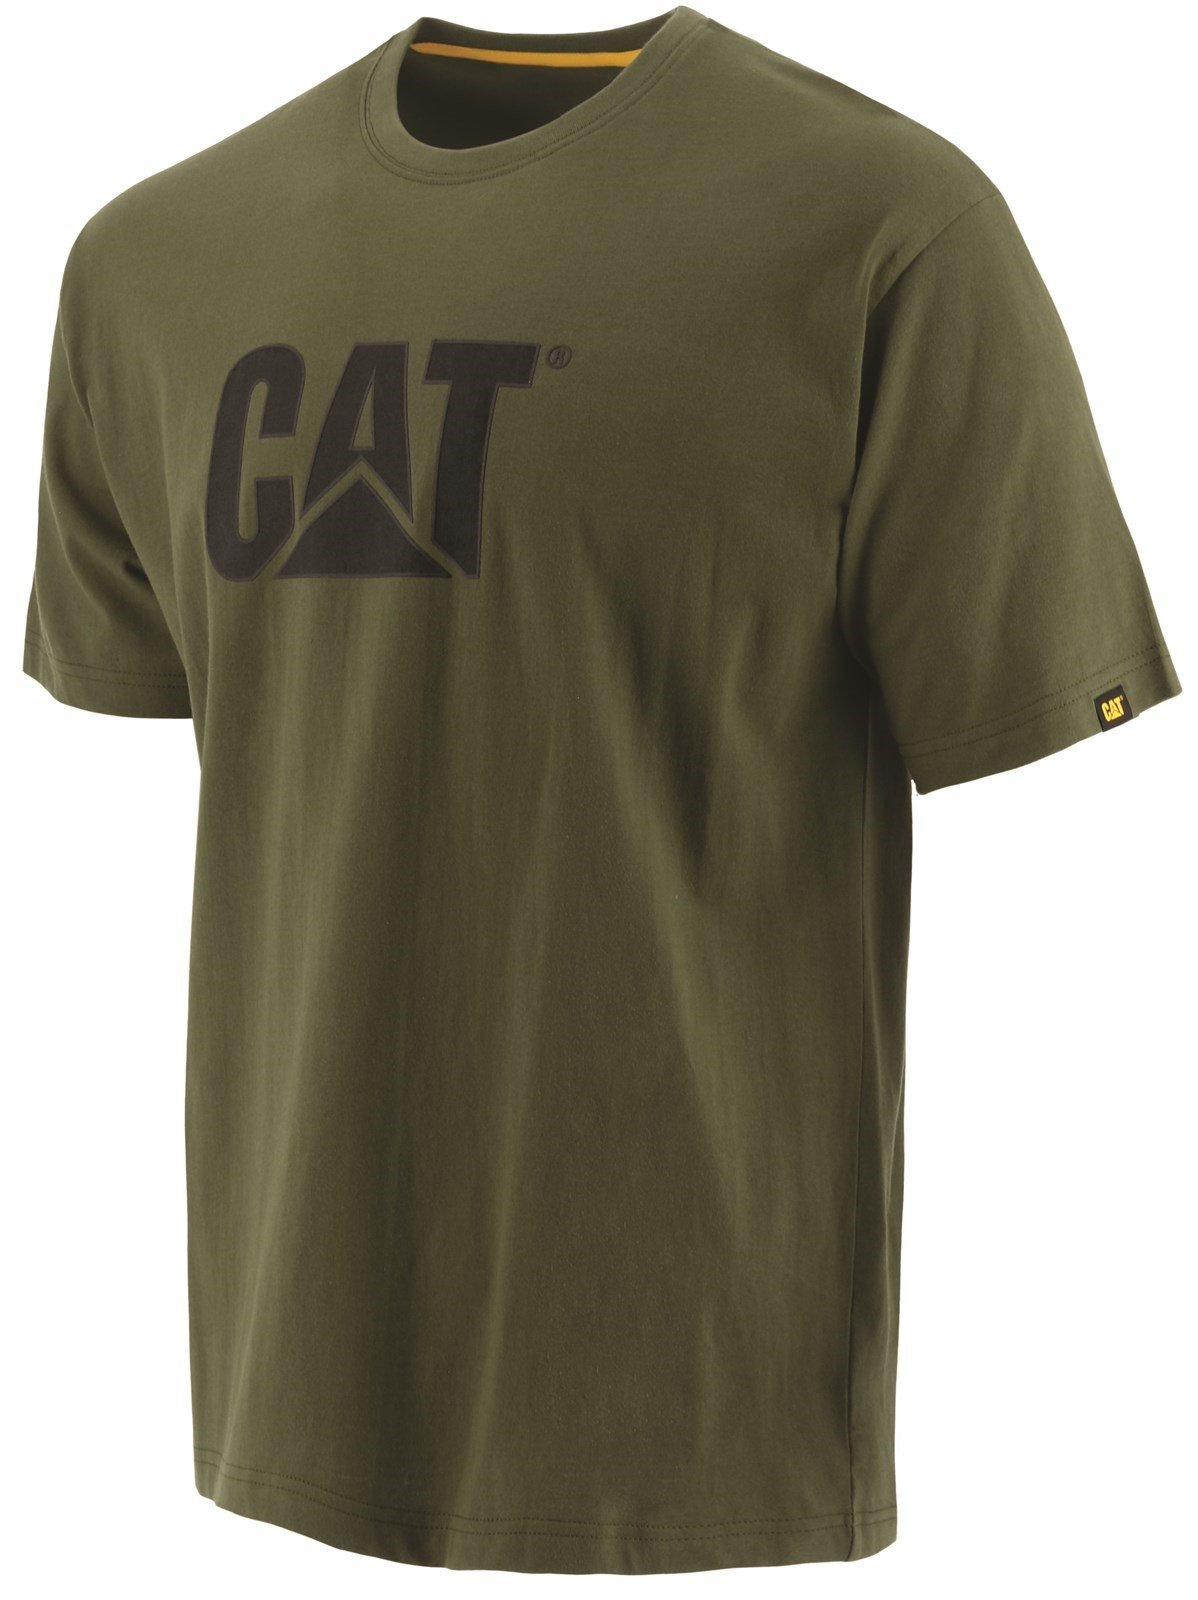 Caterpillar Unisex Trademark Logo T-Shirt Various Colours 25301 - Chive Sml